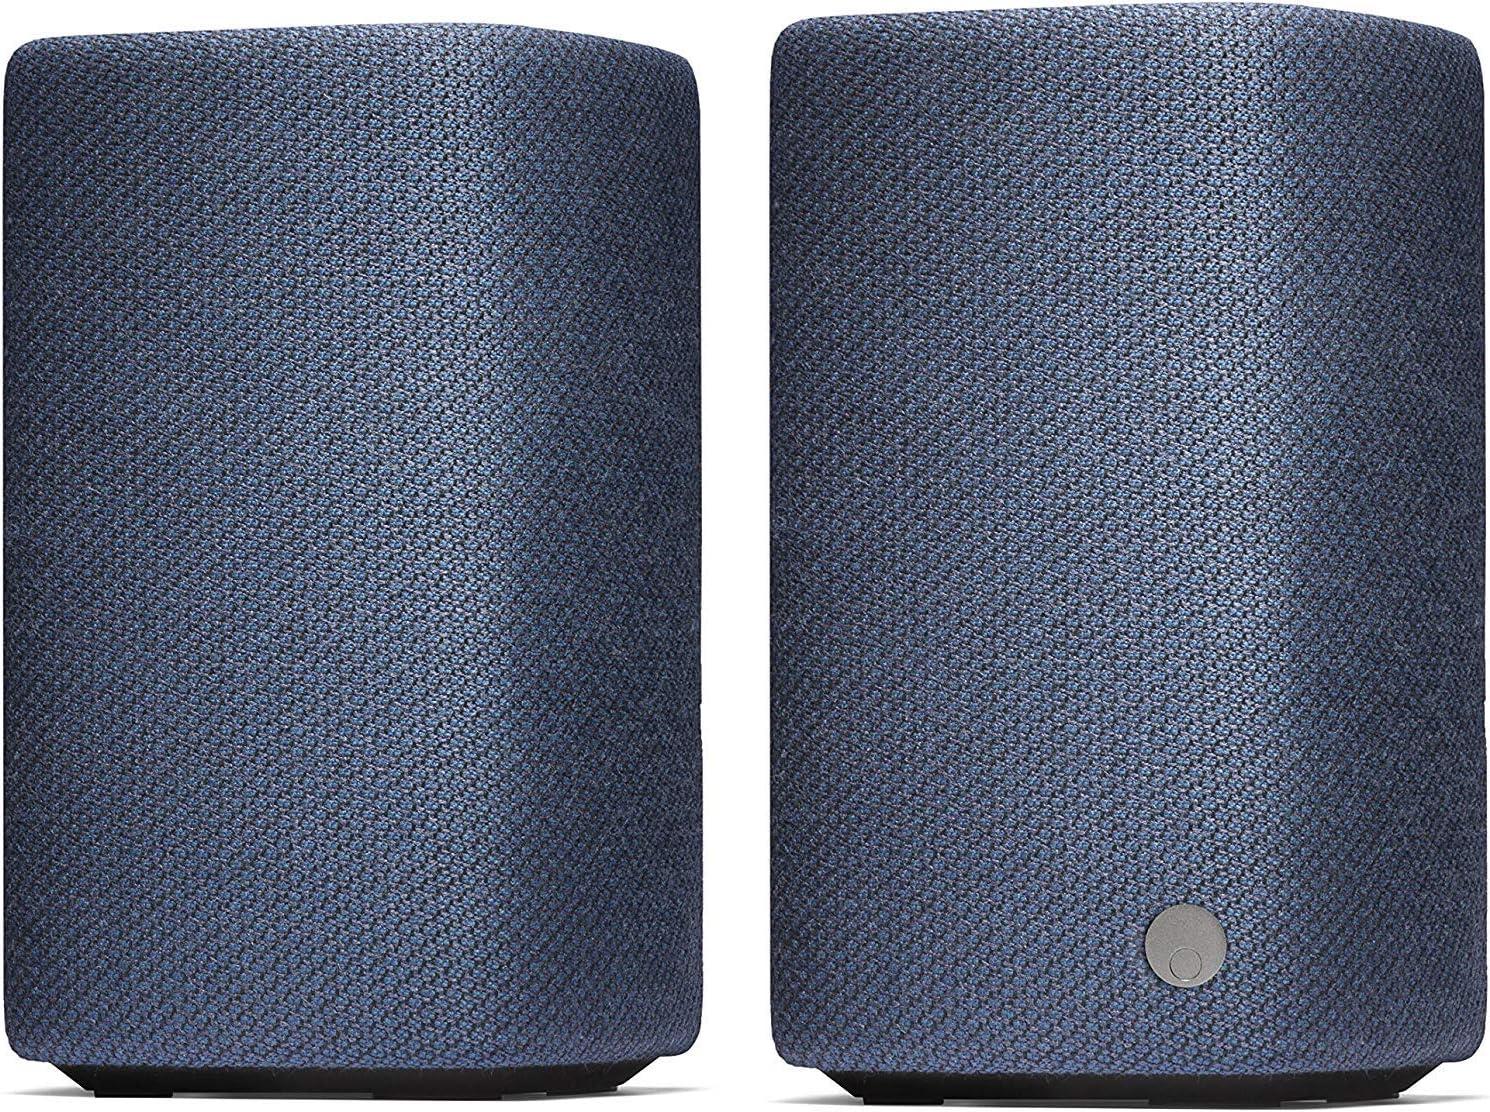 Portable Stereo Bluetooth Speakers M Cambridge Audio Yoyo Blue